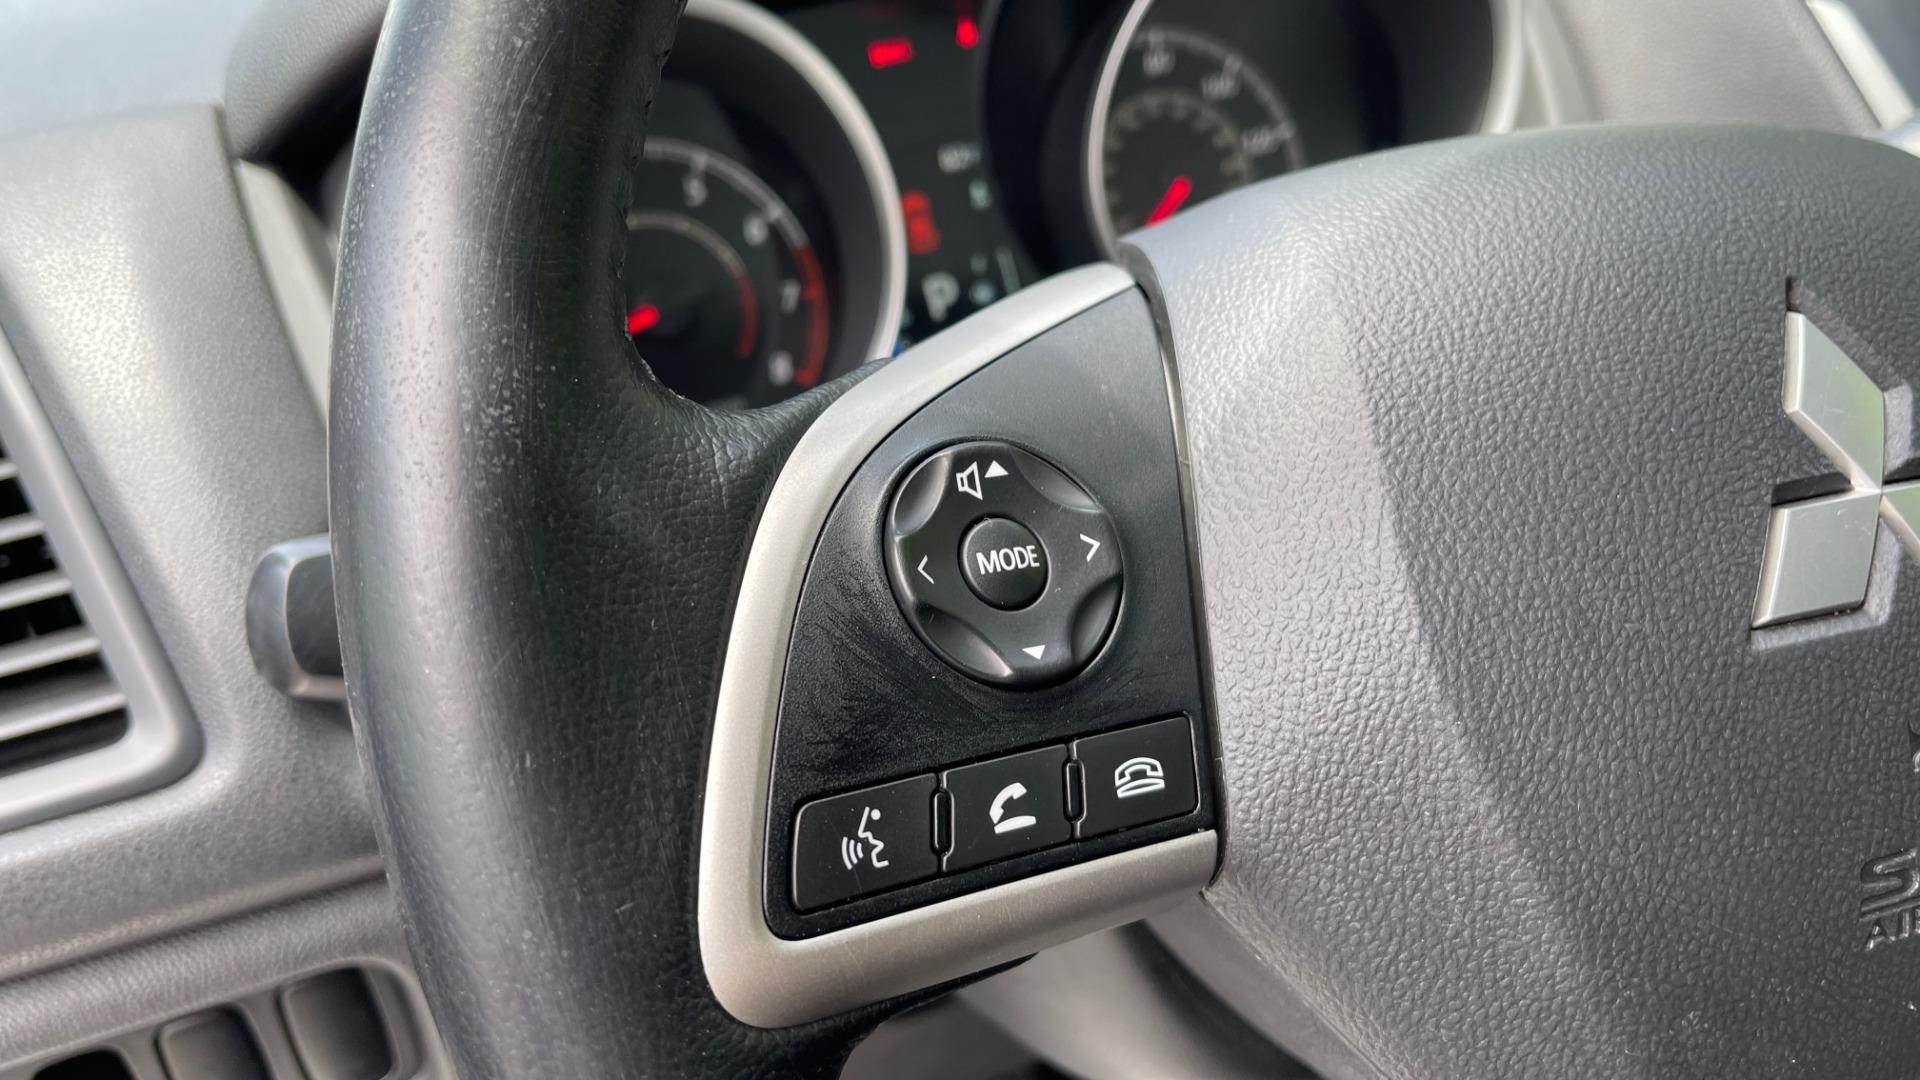 Used 2014 Mitsubishi OUTLANDER SPORT ES 2WD / 2.0L / CVT TRANS / 18IN WHEELS / 31MPG for sale $8,495 at Formula Imports in Charlotte NC 28227 29